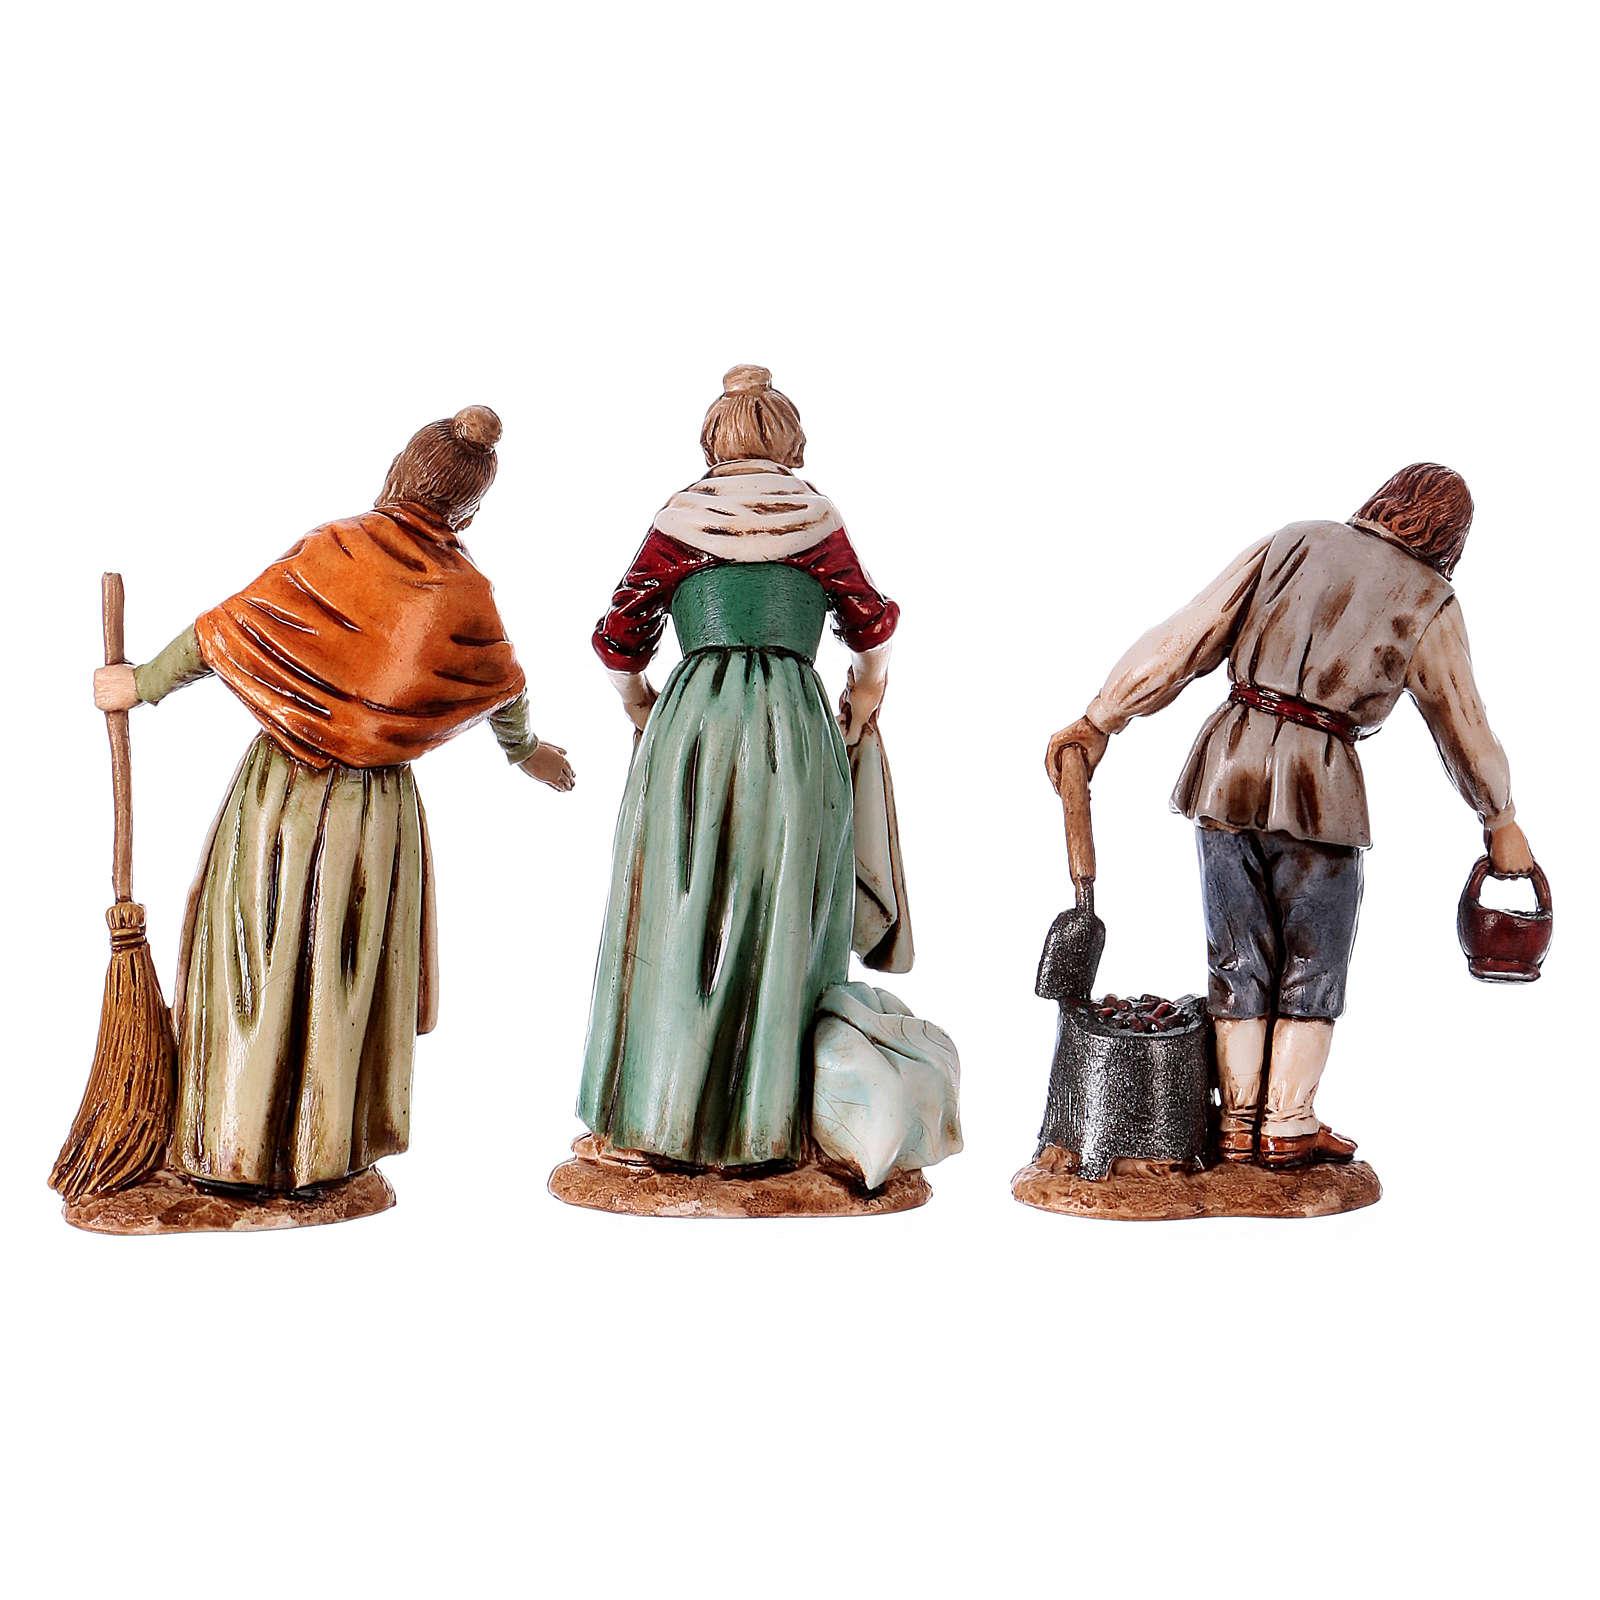 Figurines on balcony for 10 cm Nativity scene by Moranduzzo, set of 3 4